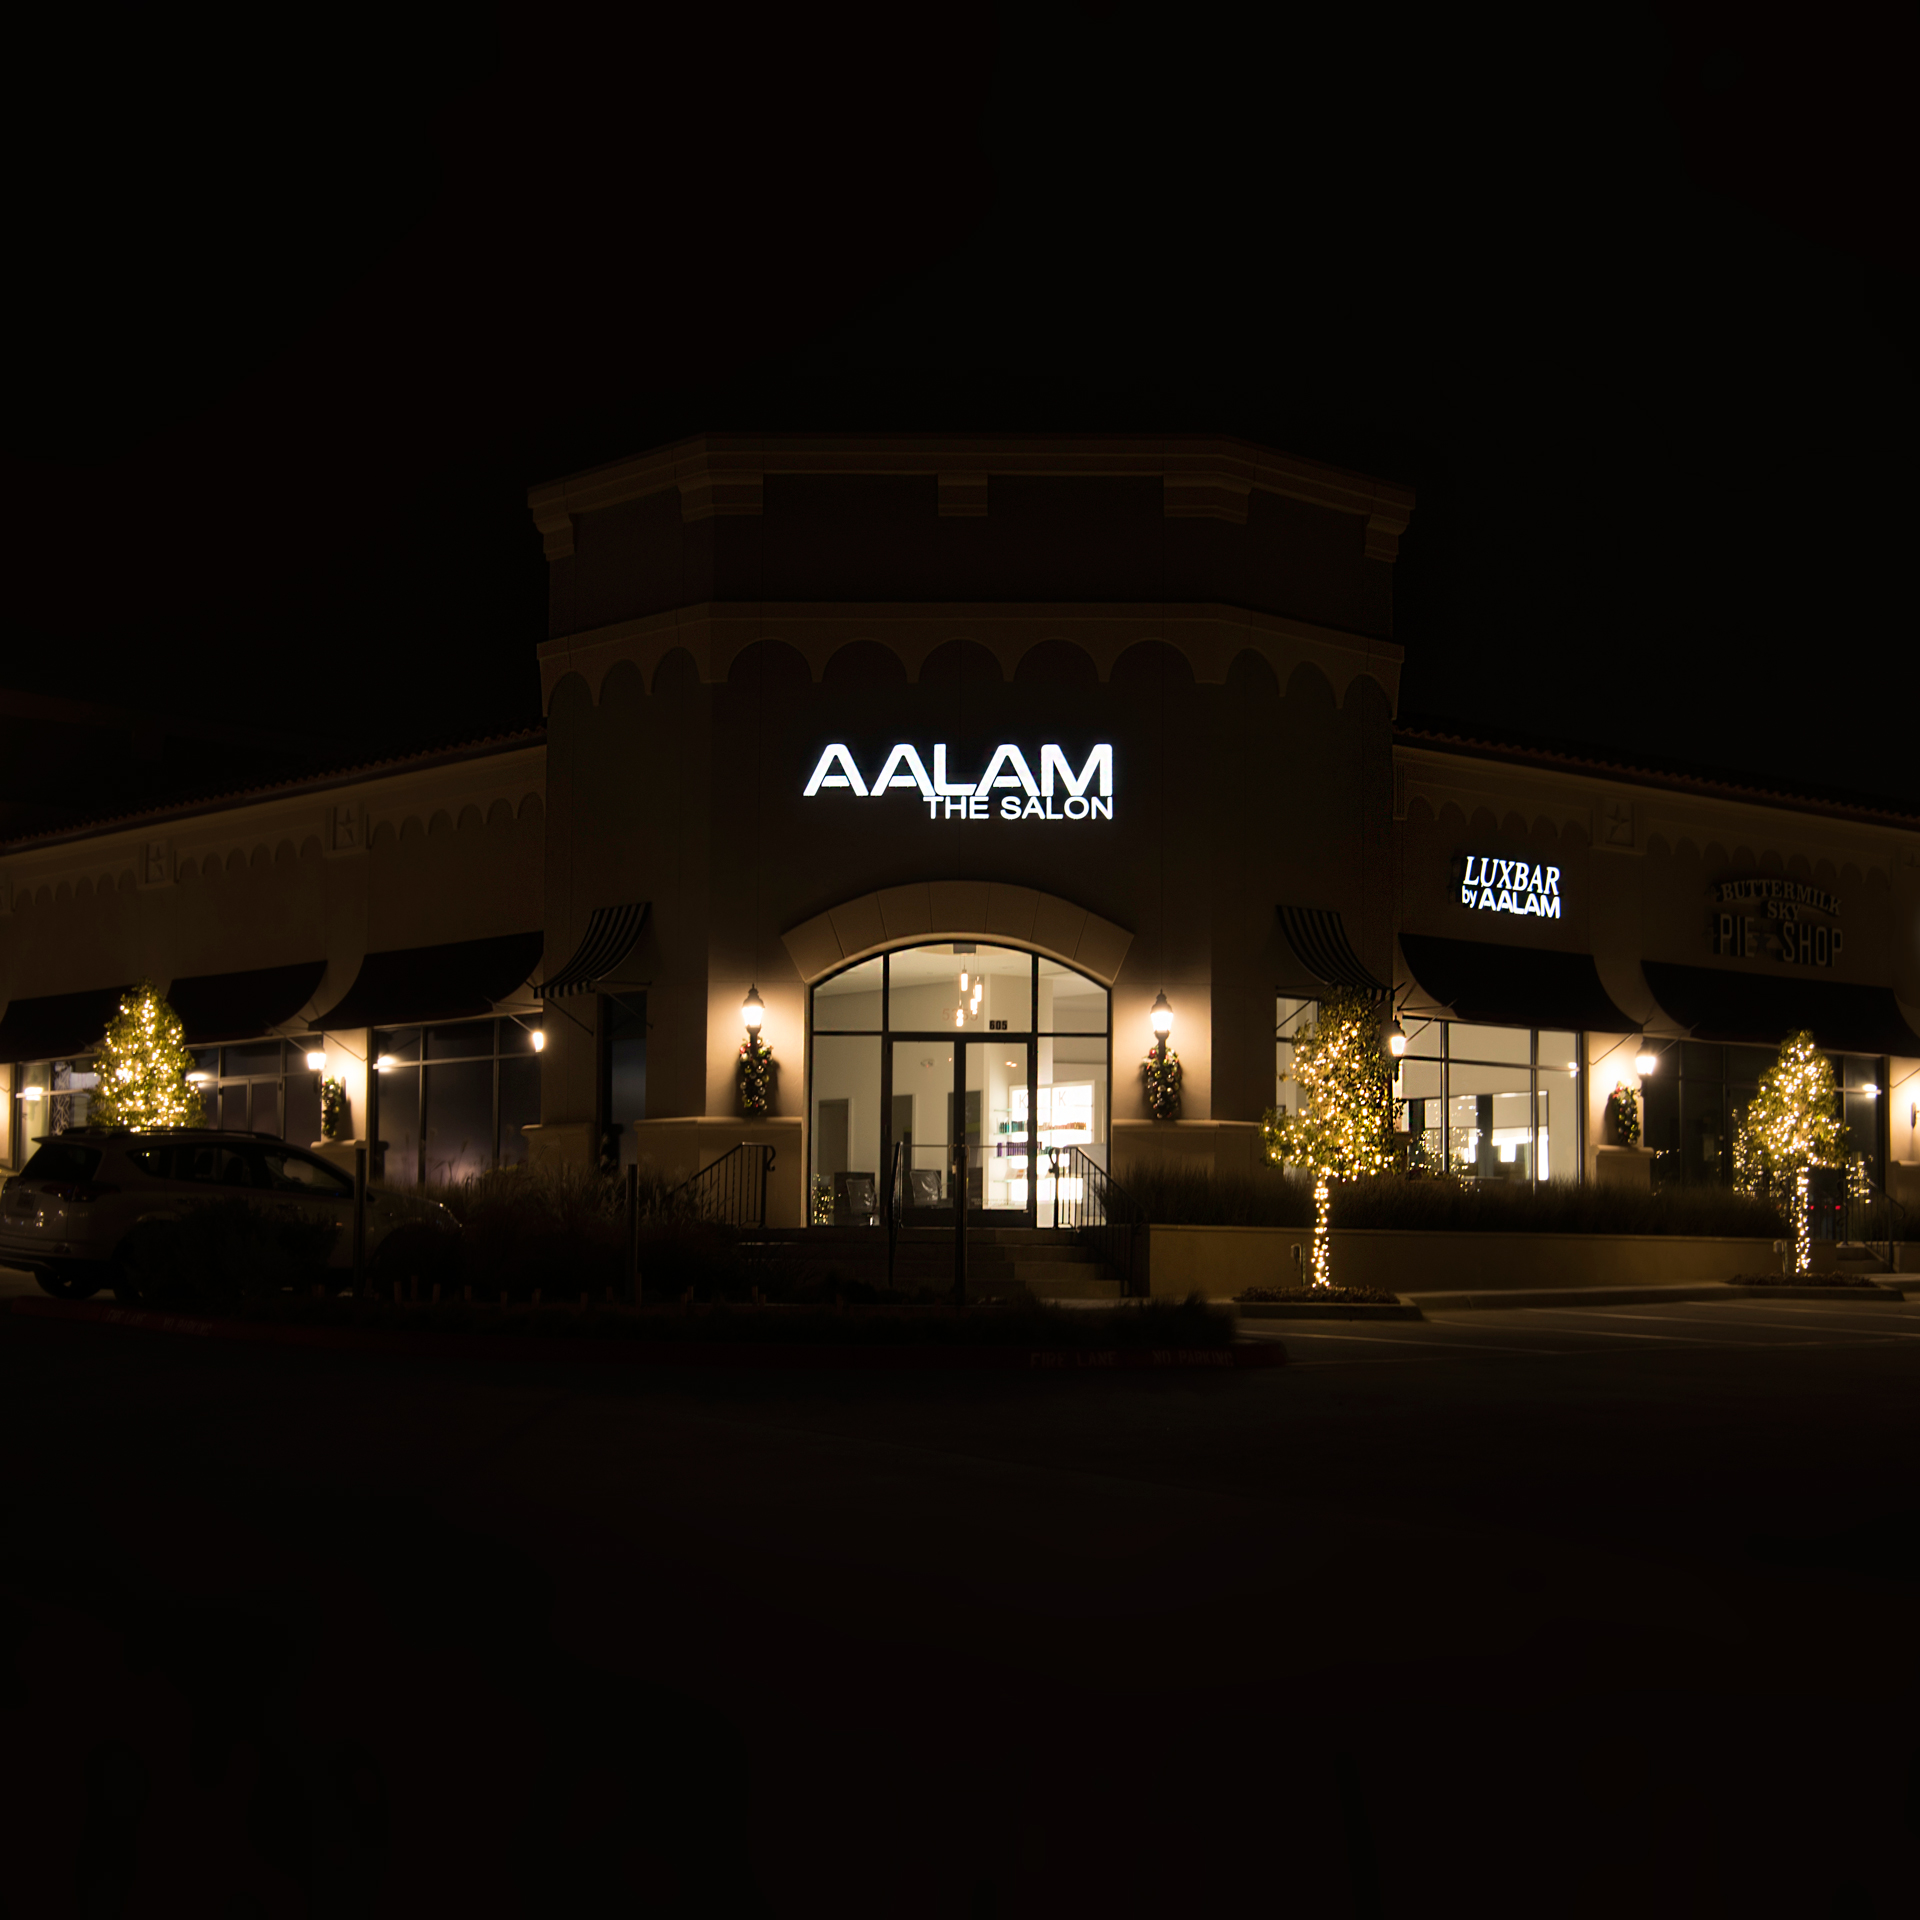 AALAM The salon Frisco TX Best hair salon Shop at Starwood Frisco TX Upscale hair salon High End men Women Haircut Highlights Balayage 5355 Dallas Parkway #605 Frisco TX 75034 LUXBAR by AALAM